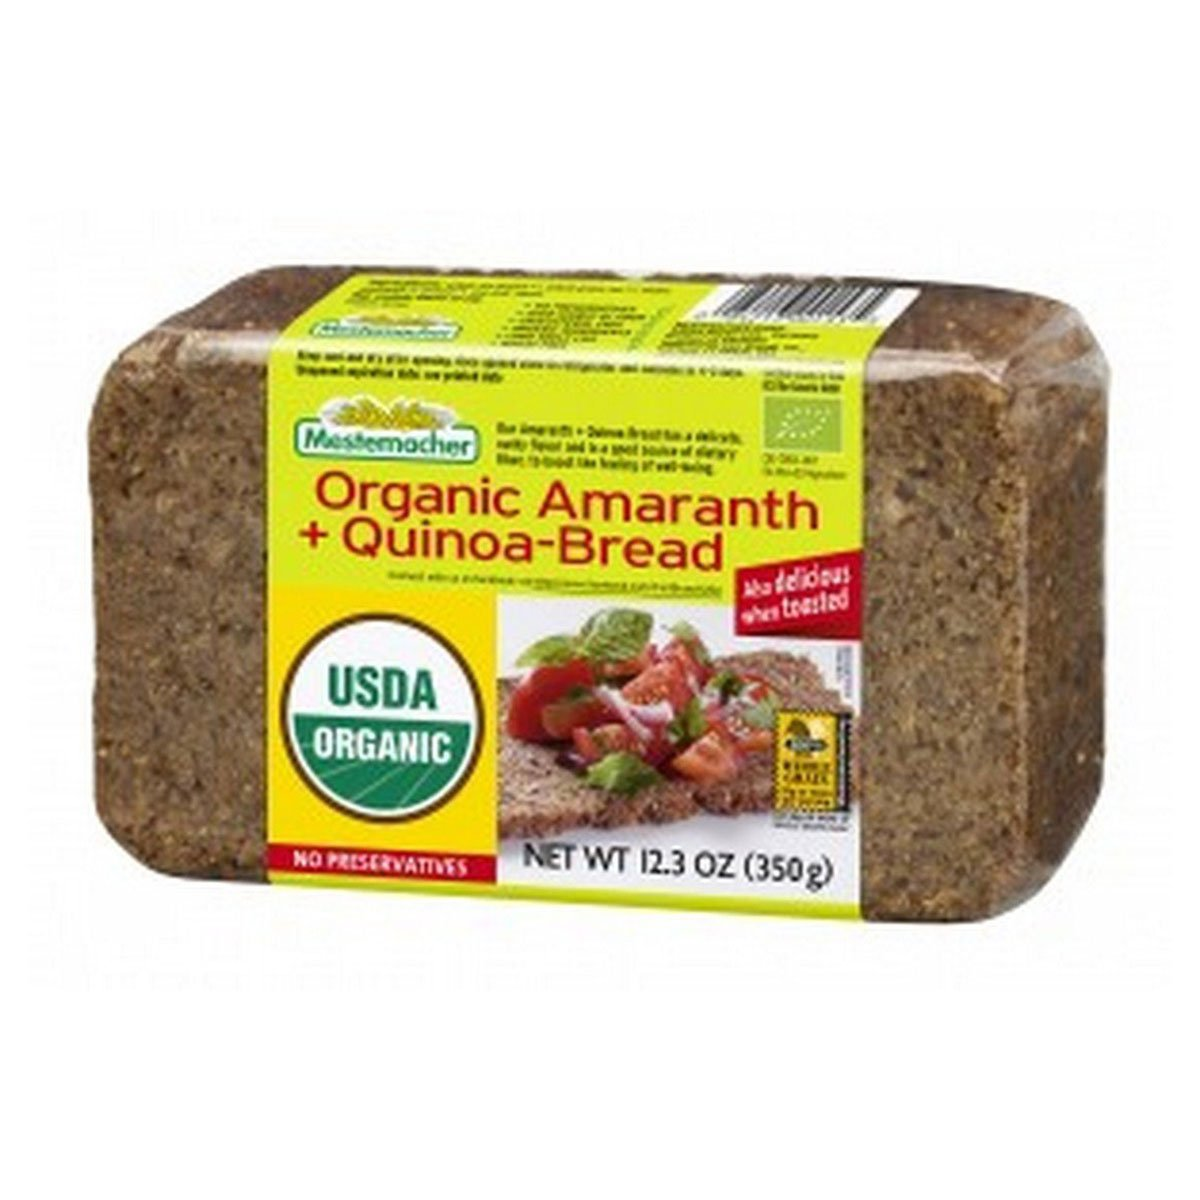 BREAD, OG2, AMARANTH QUINOA, Pack of 9